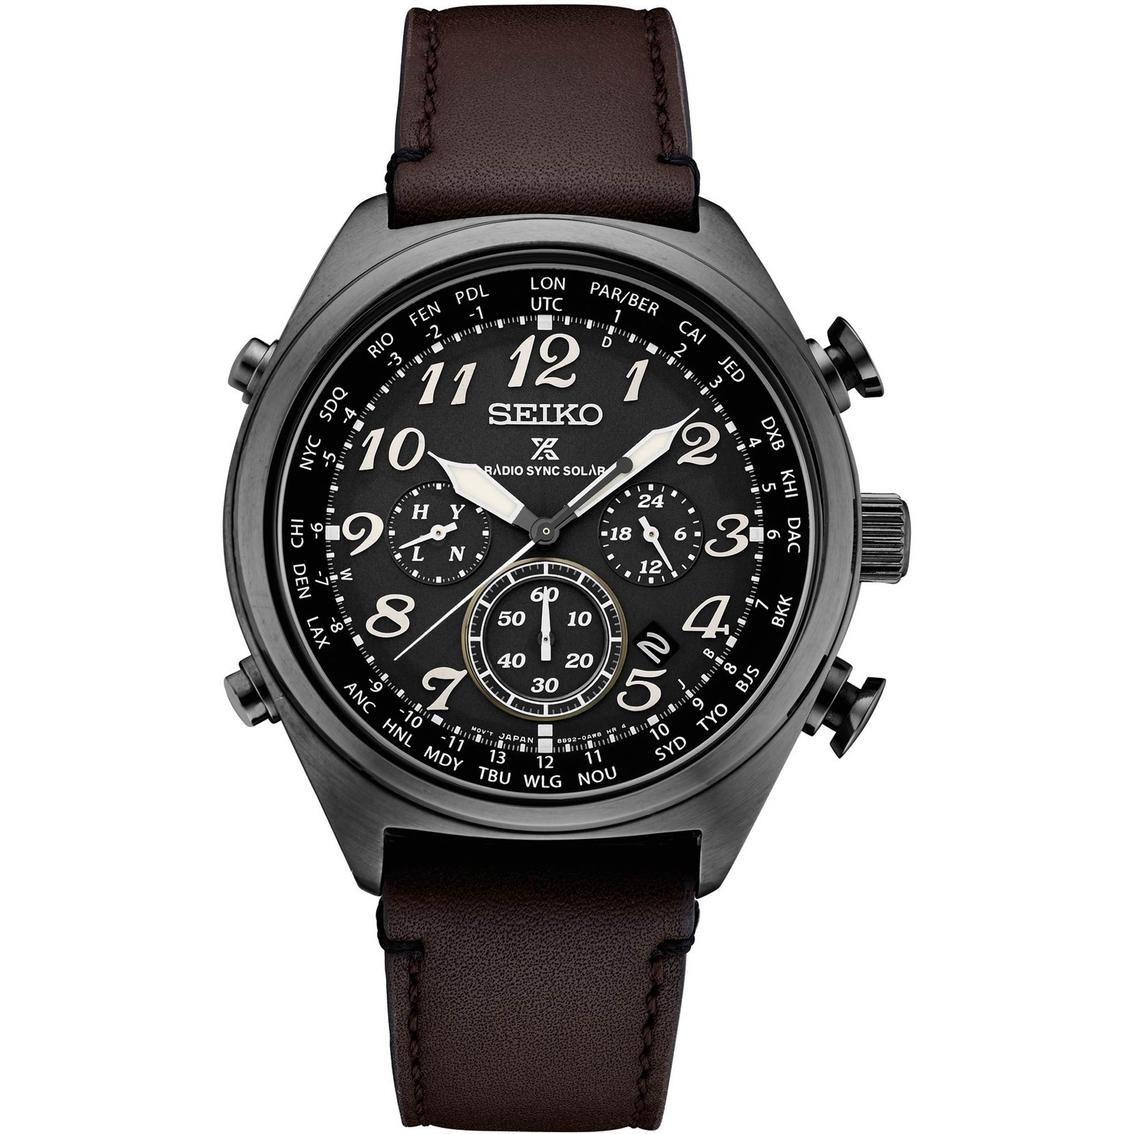 Win A Seiko Prospex Radiosync Solar World Time Chronograph Watch photo